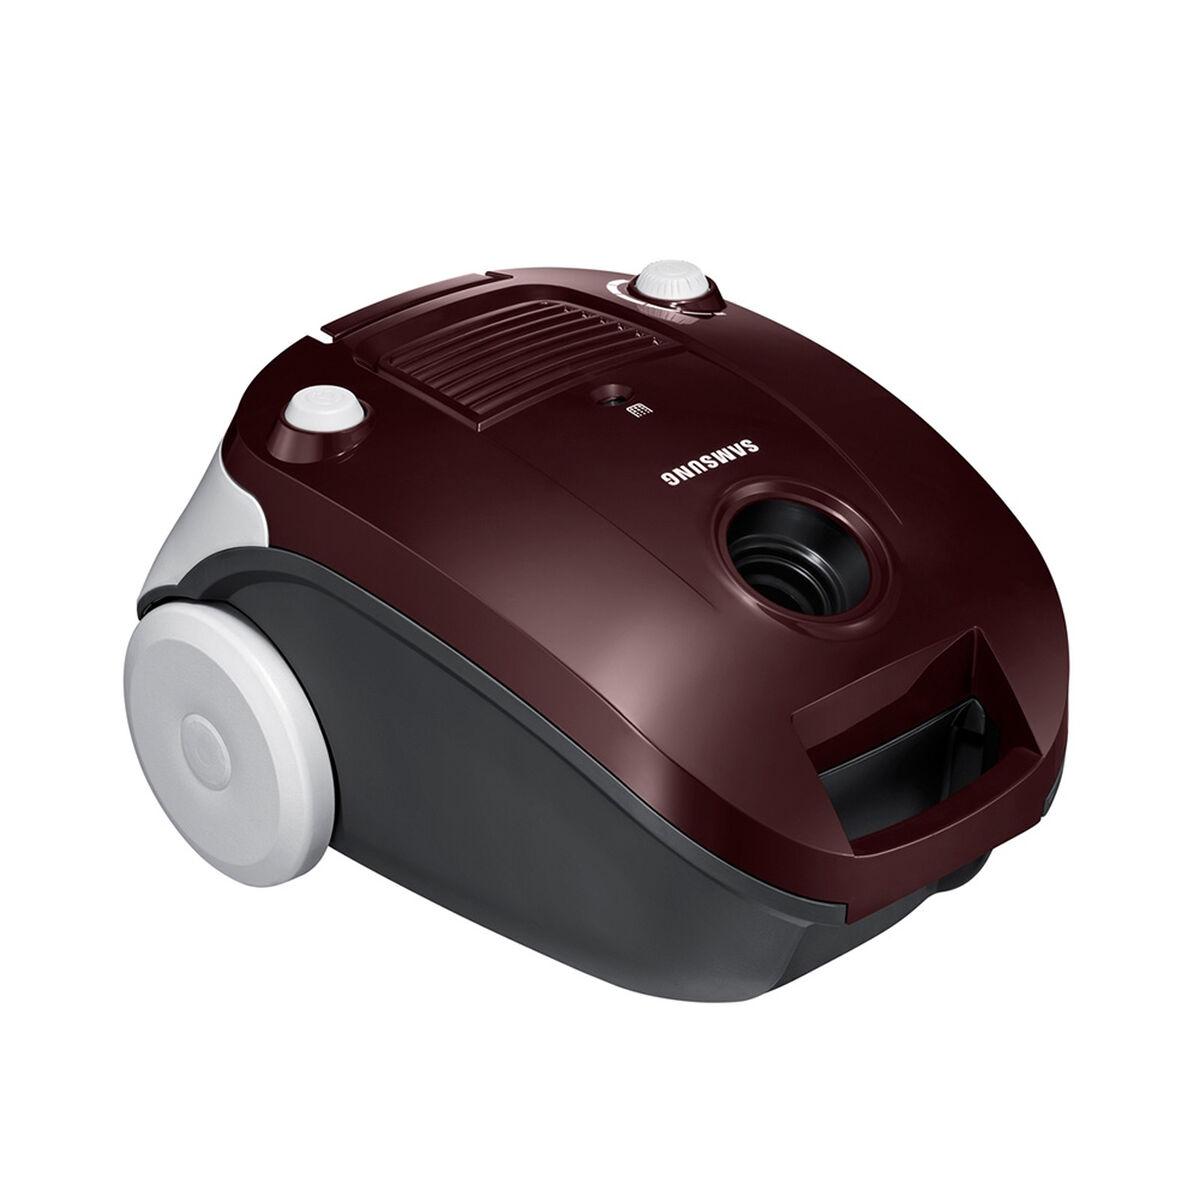 Aspiradora Samsung VCC4190V3E/XZS 2000 W